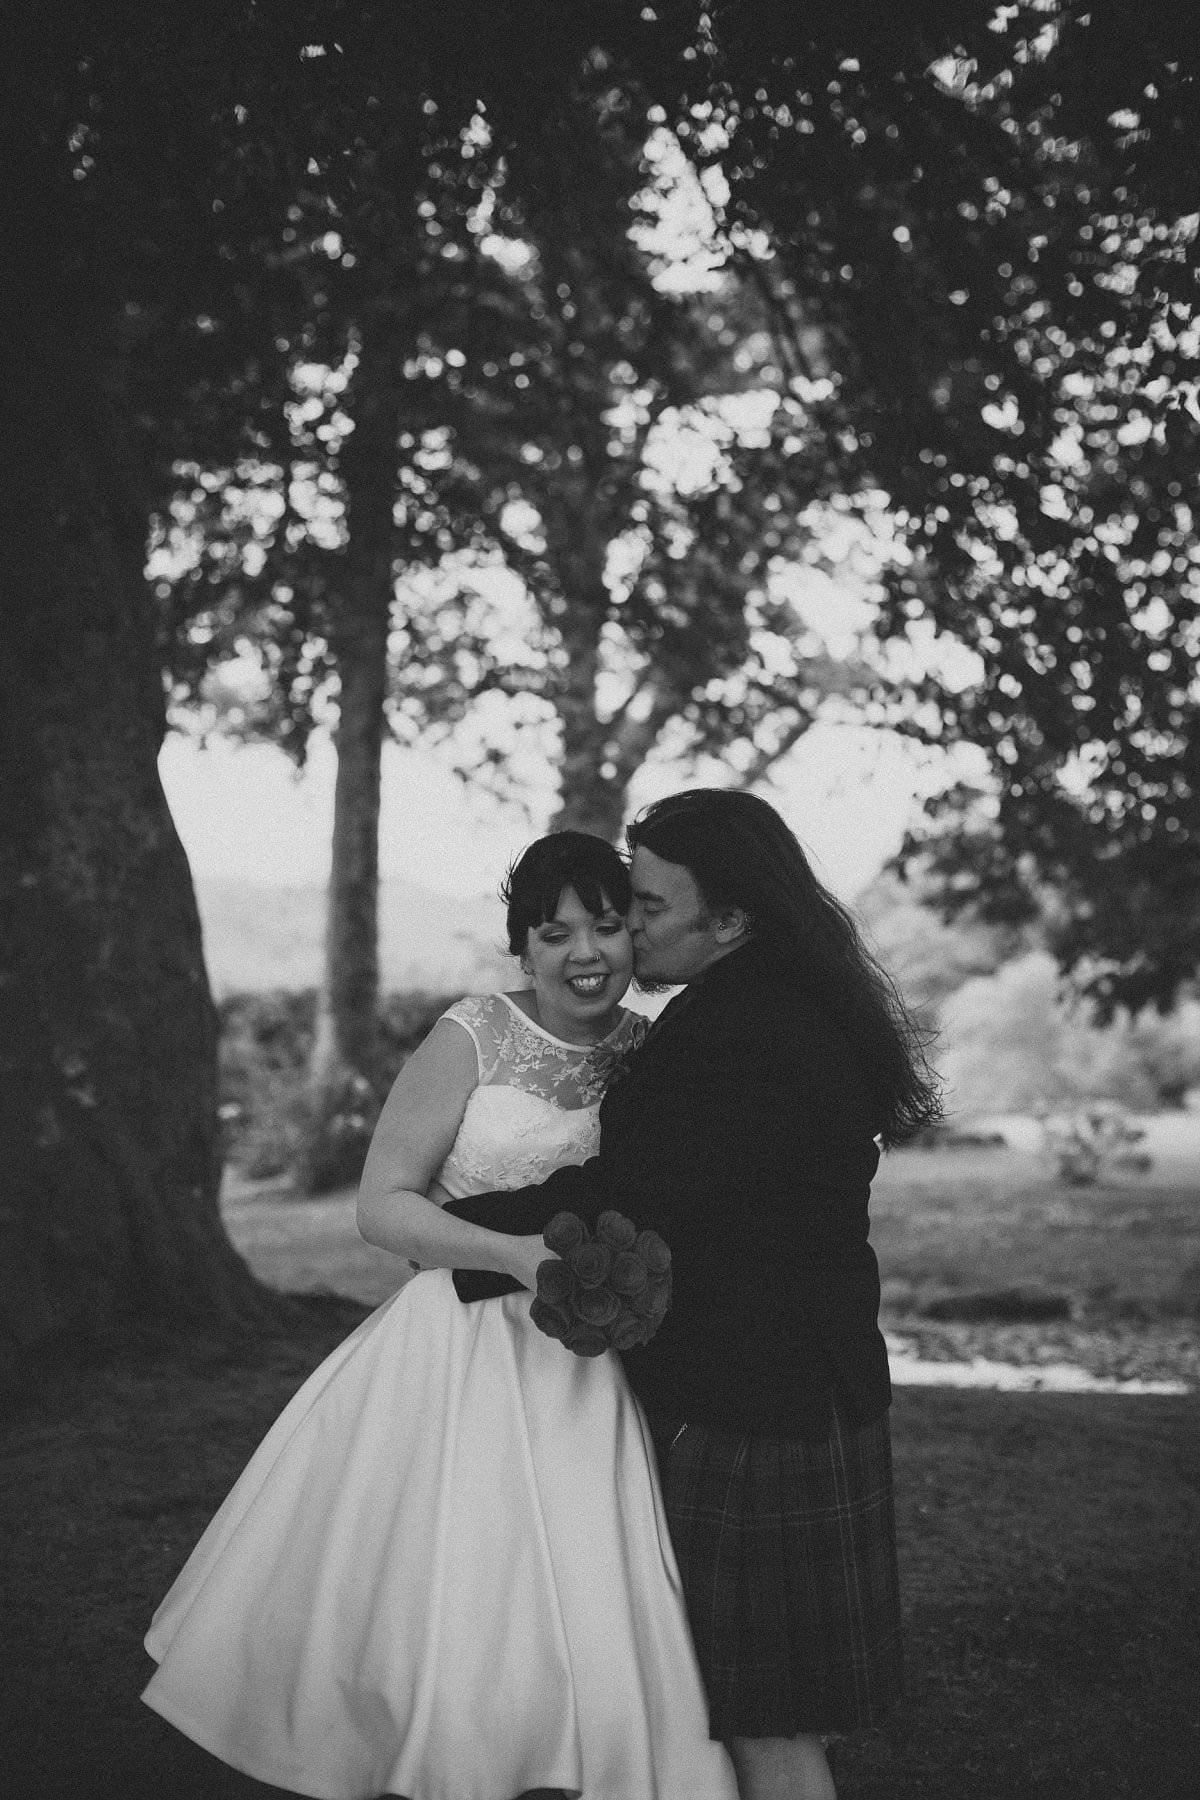 artistic-wedding-photography-altskeith-house-070